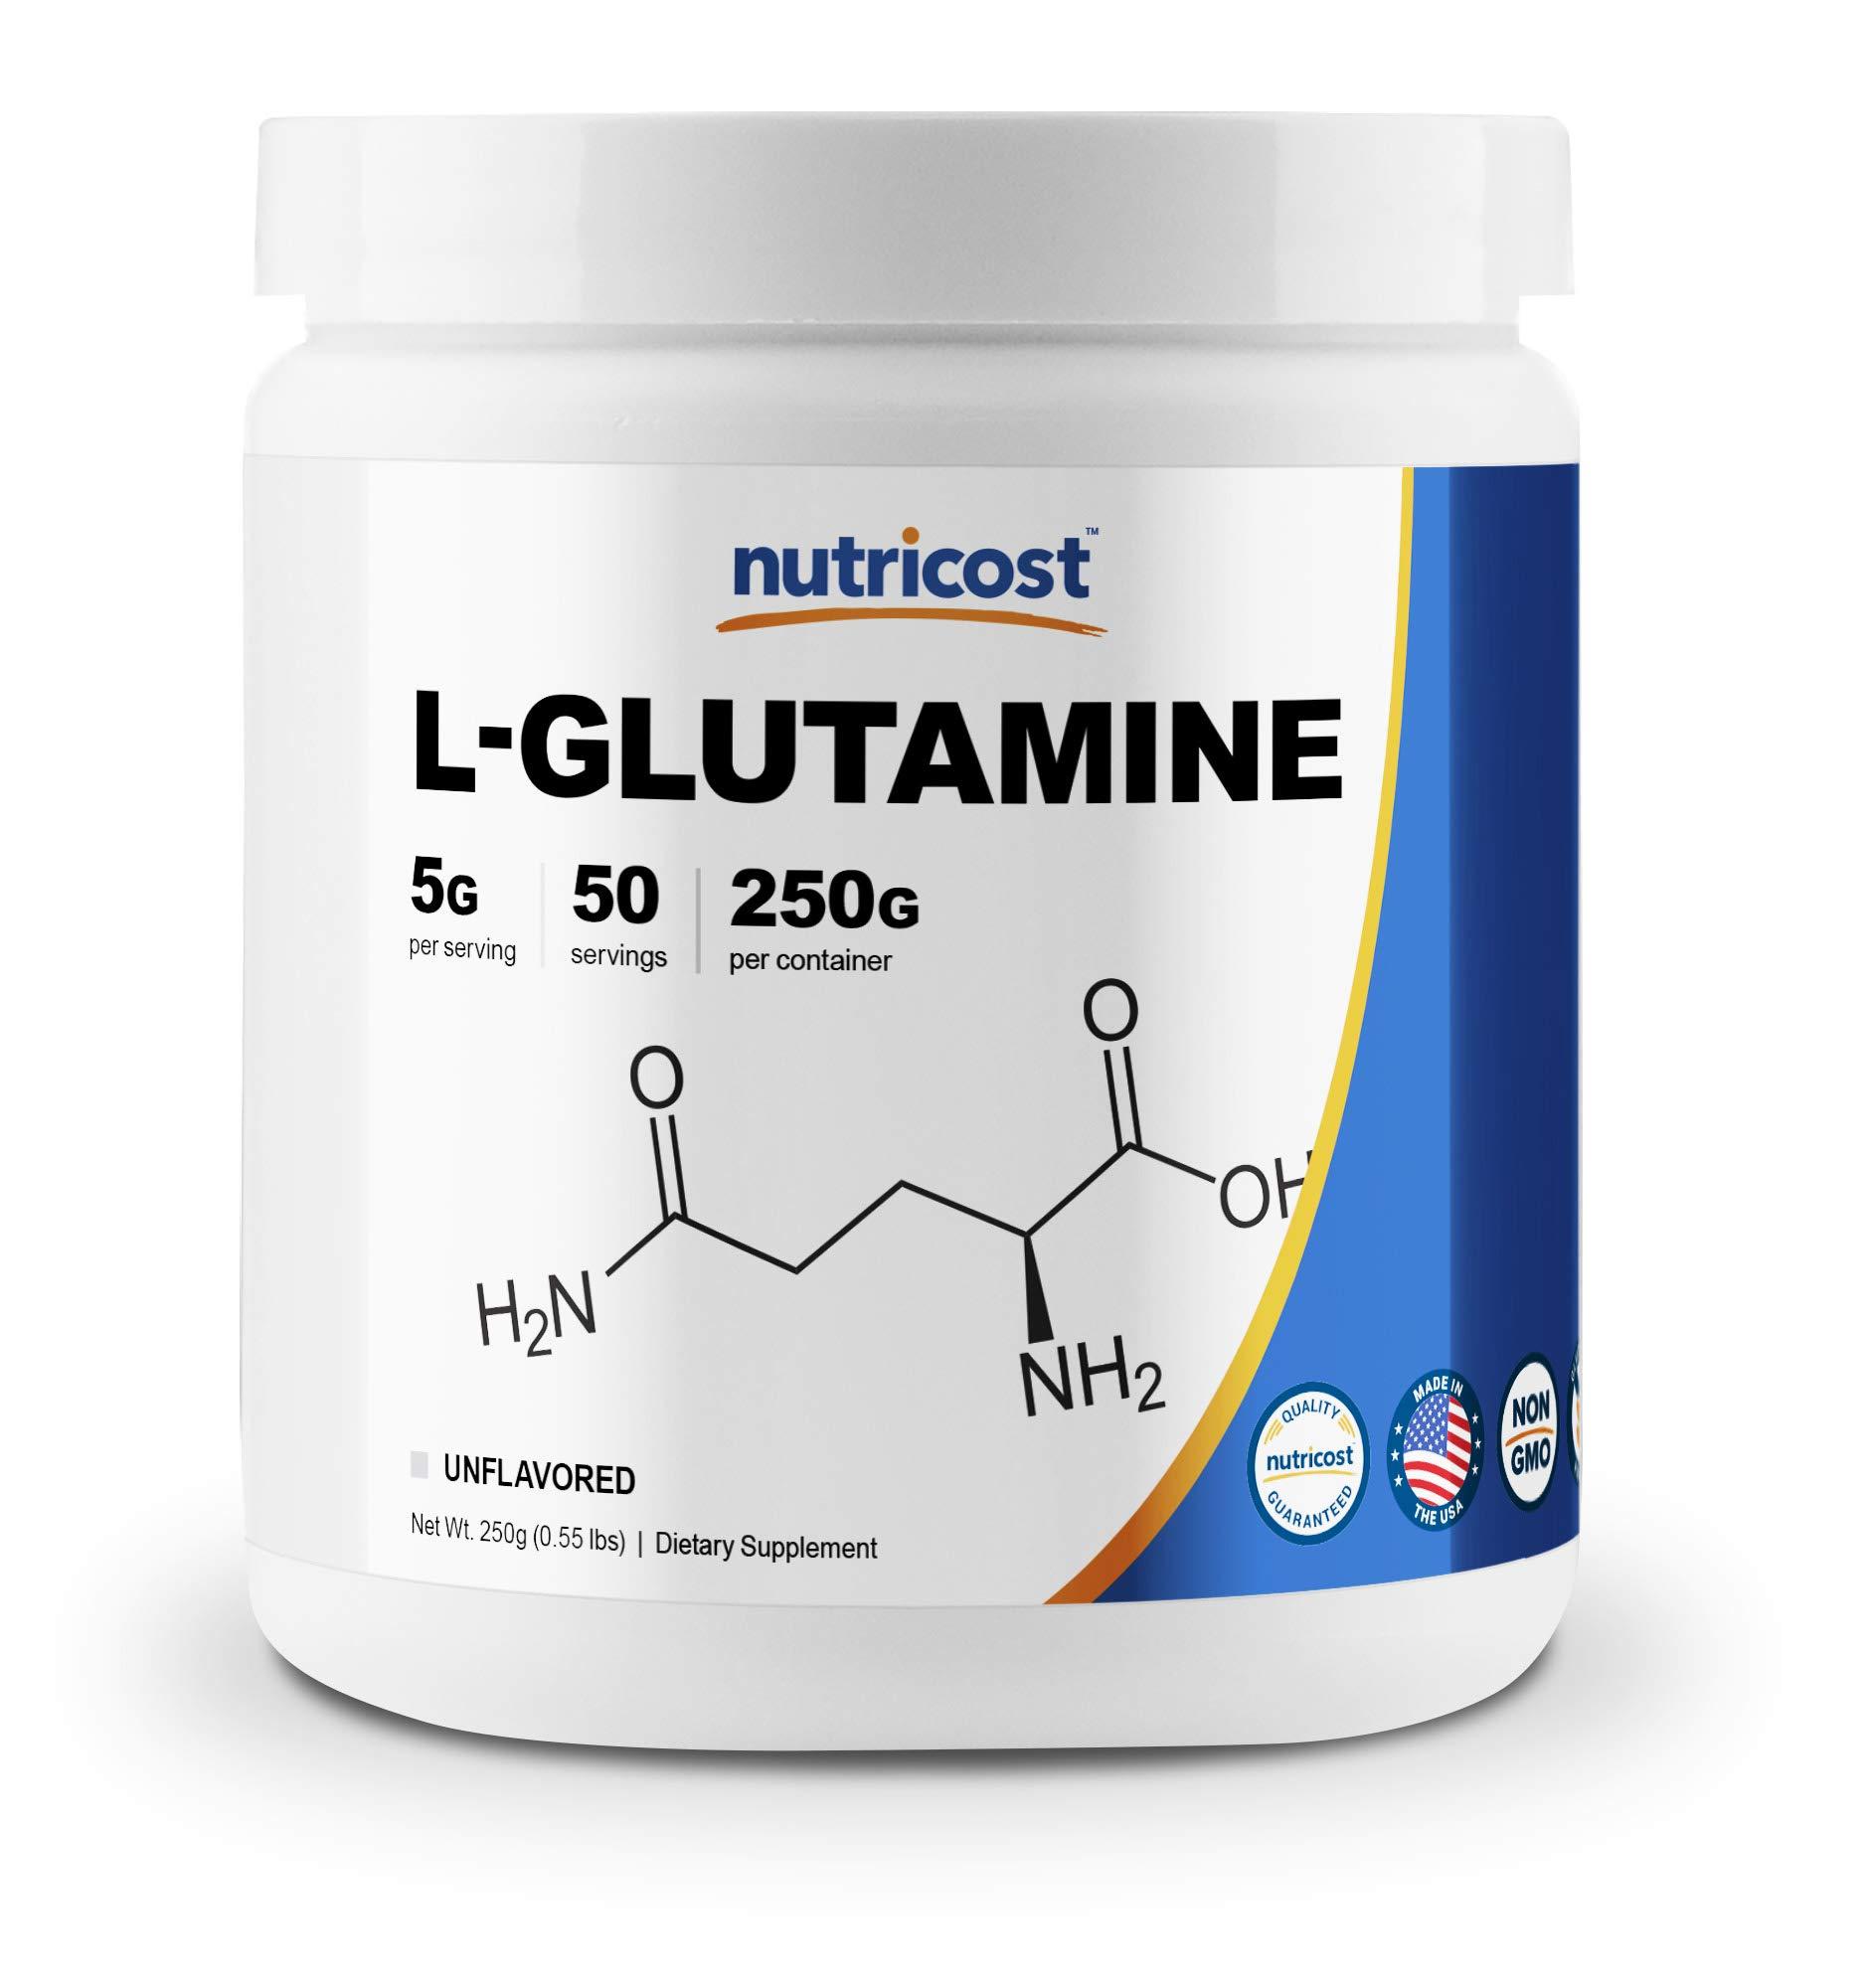 Nutricost L-Glutamine Powder 250 Grams by Nutricost